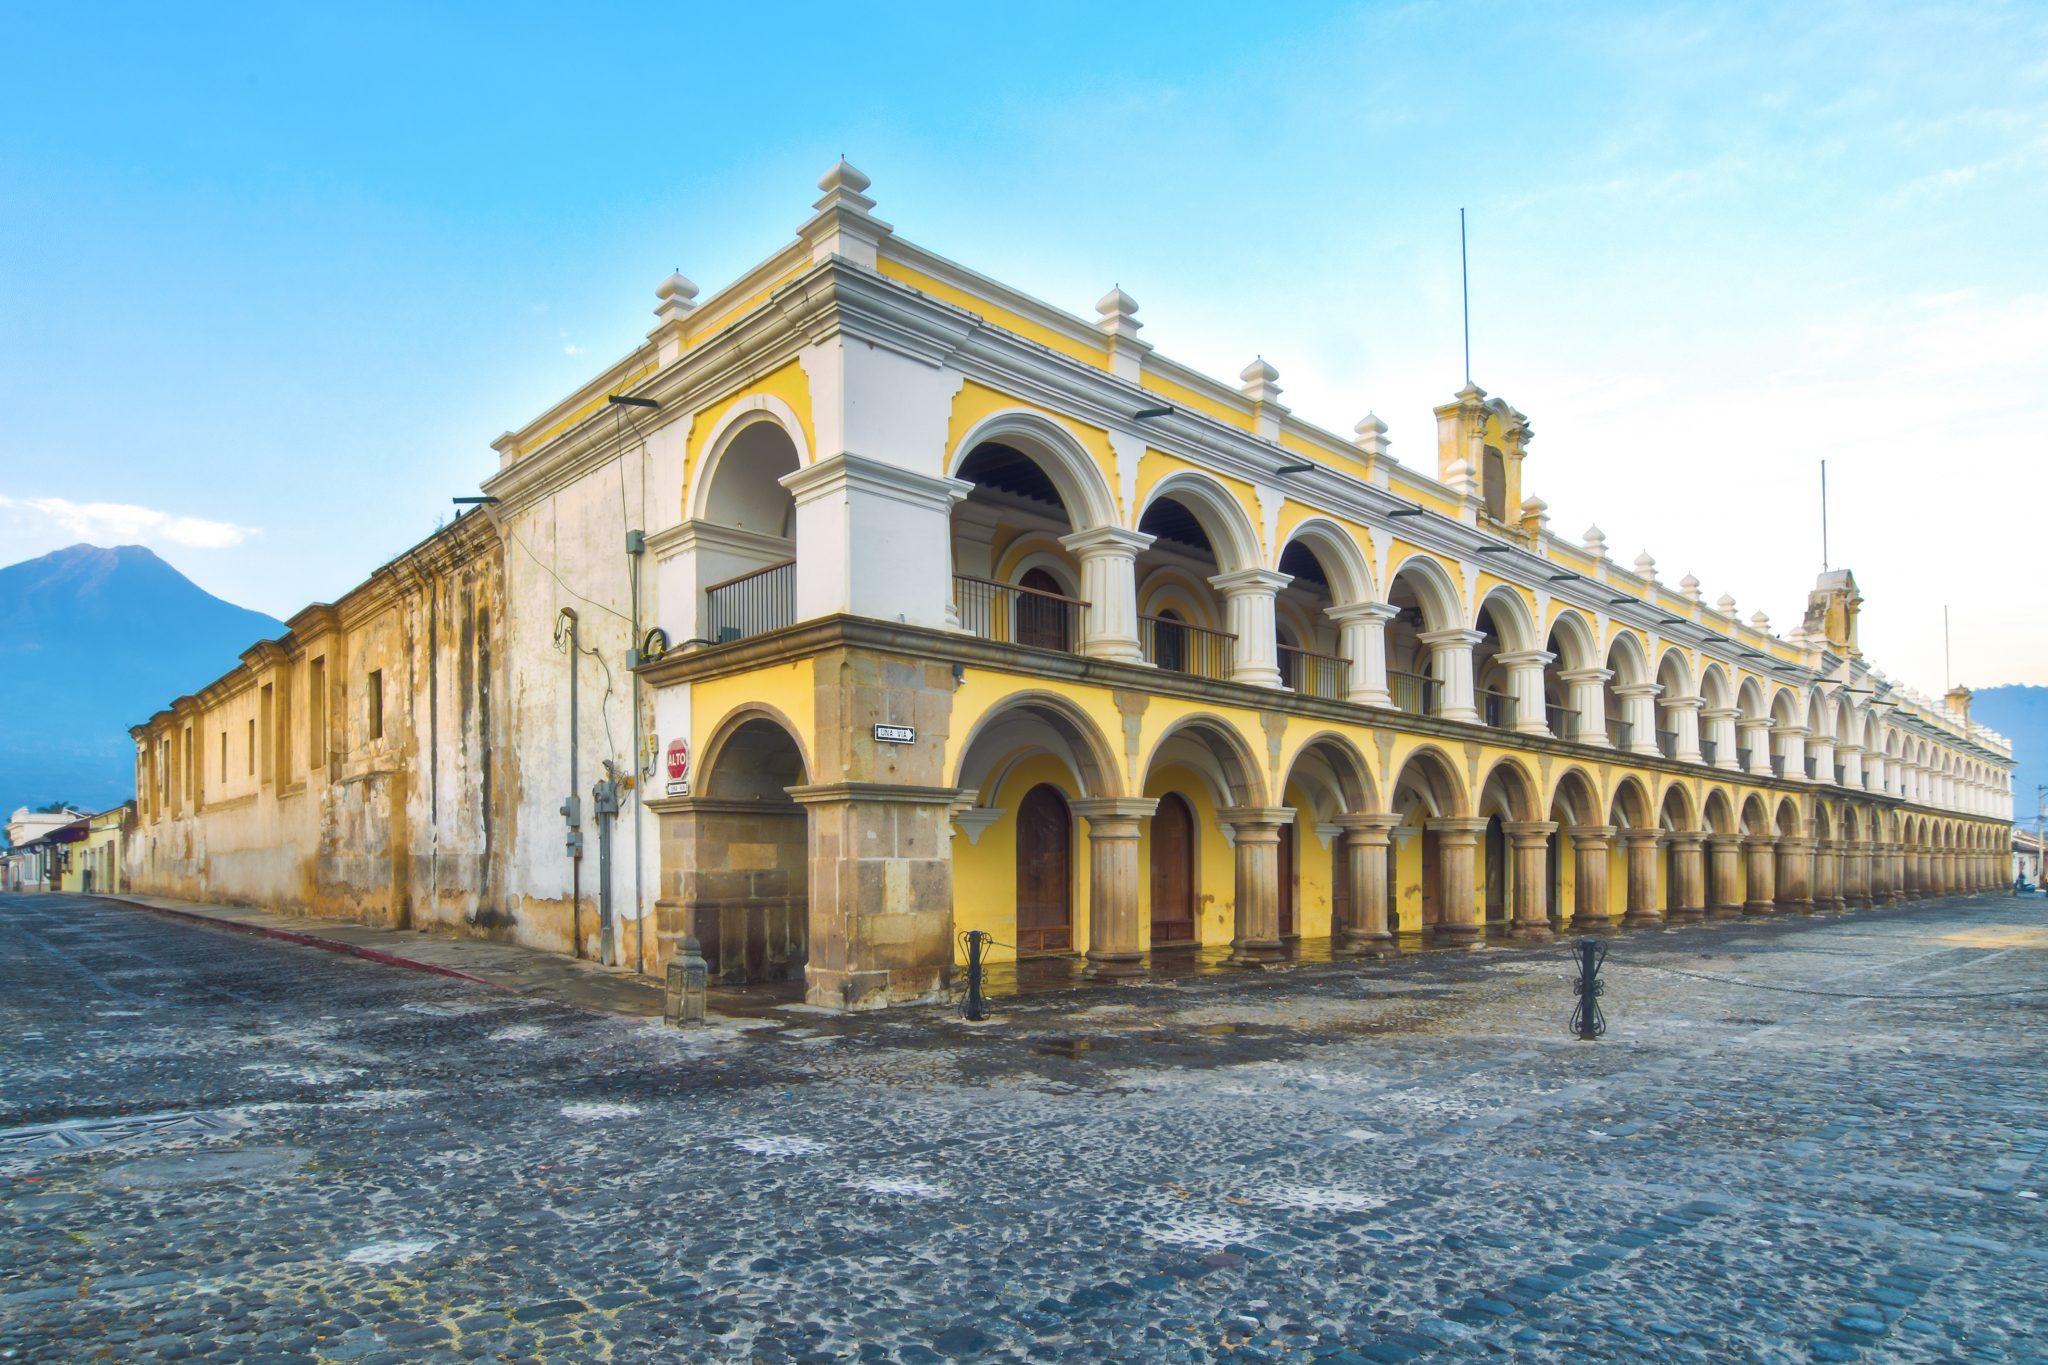 National Palace of Antigua Guatemala